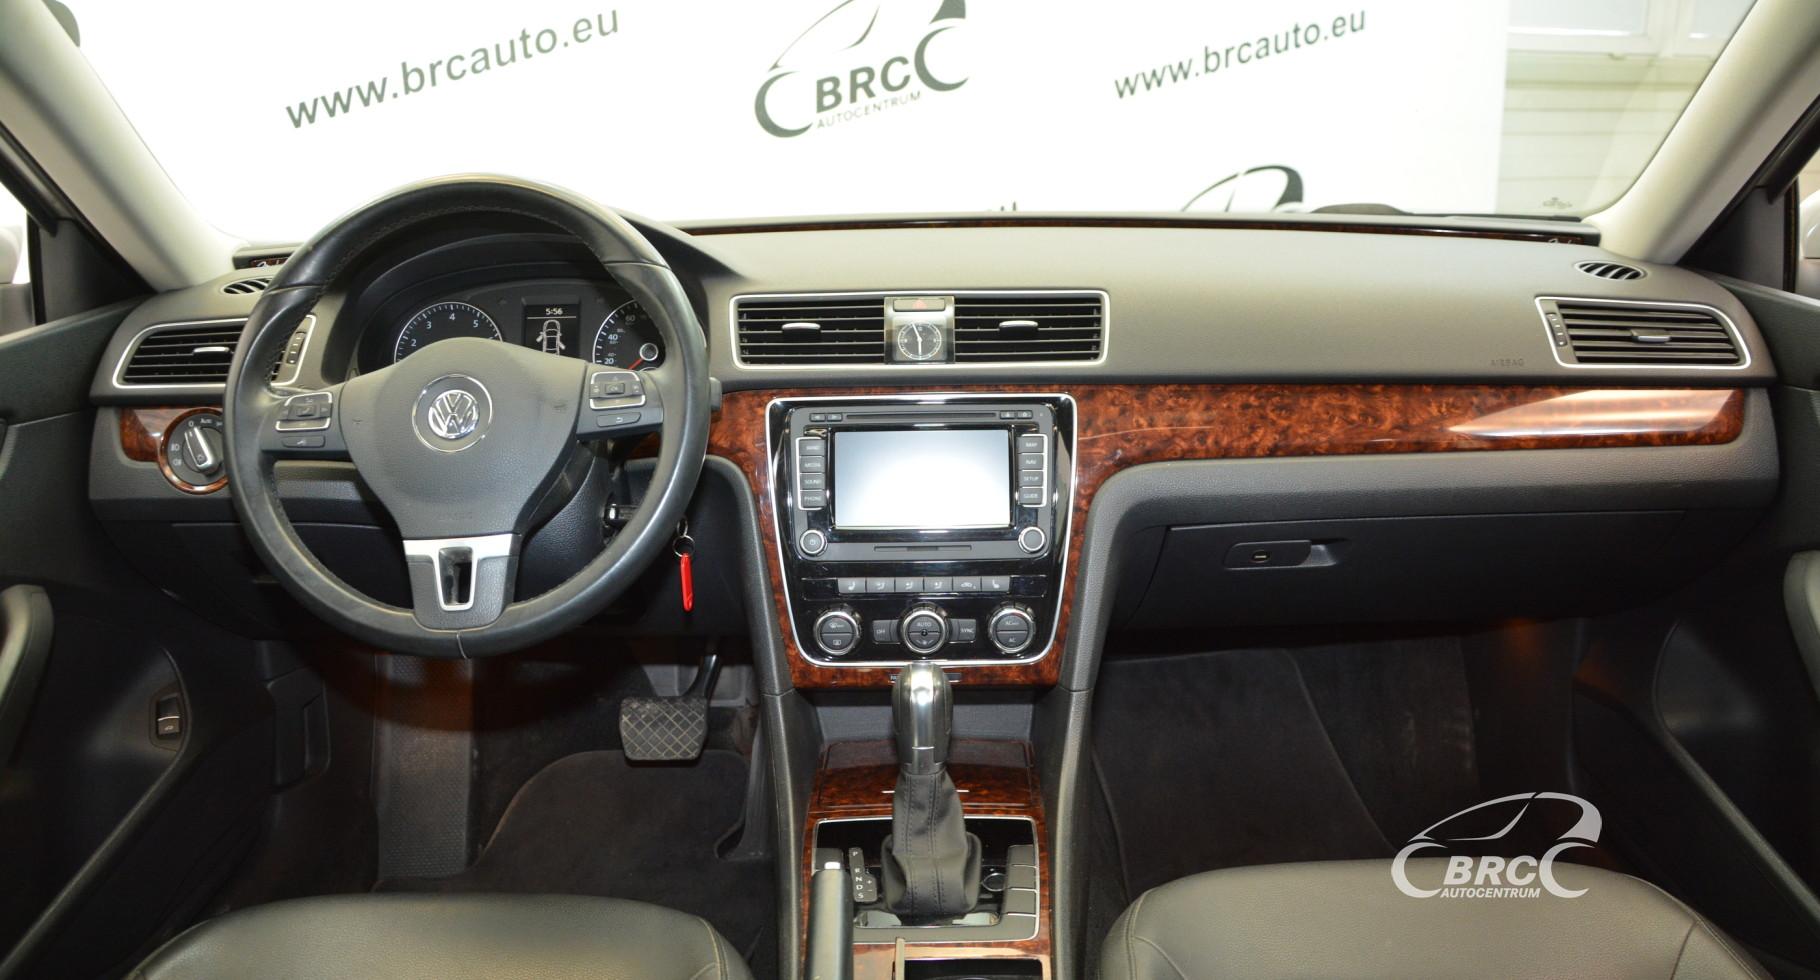 Volkswagen Passat 2.5 SEL Automatas